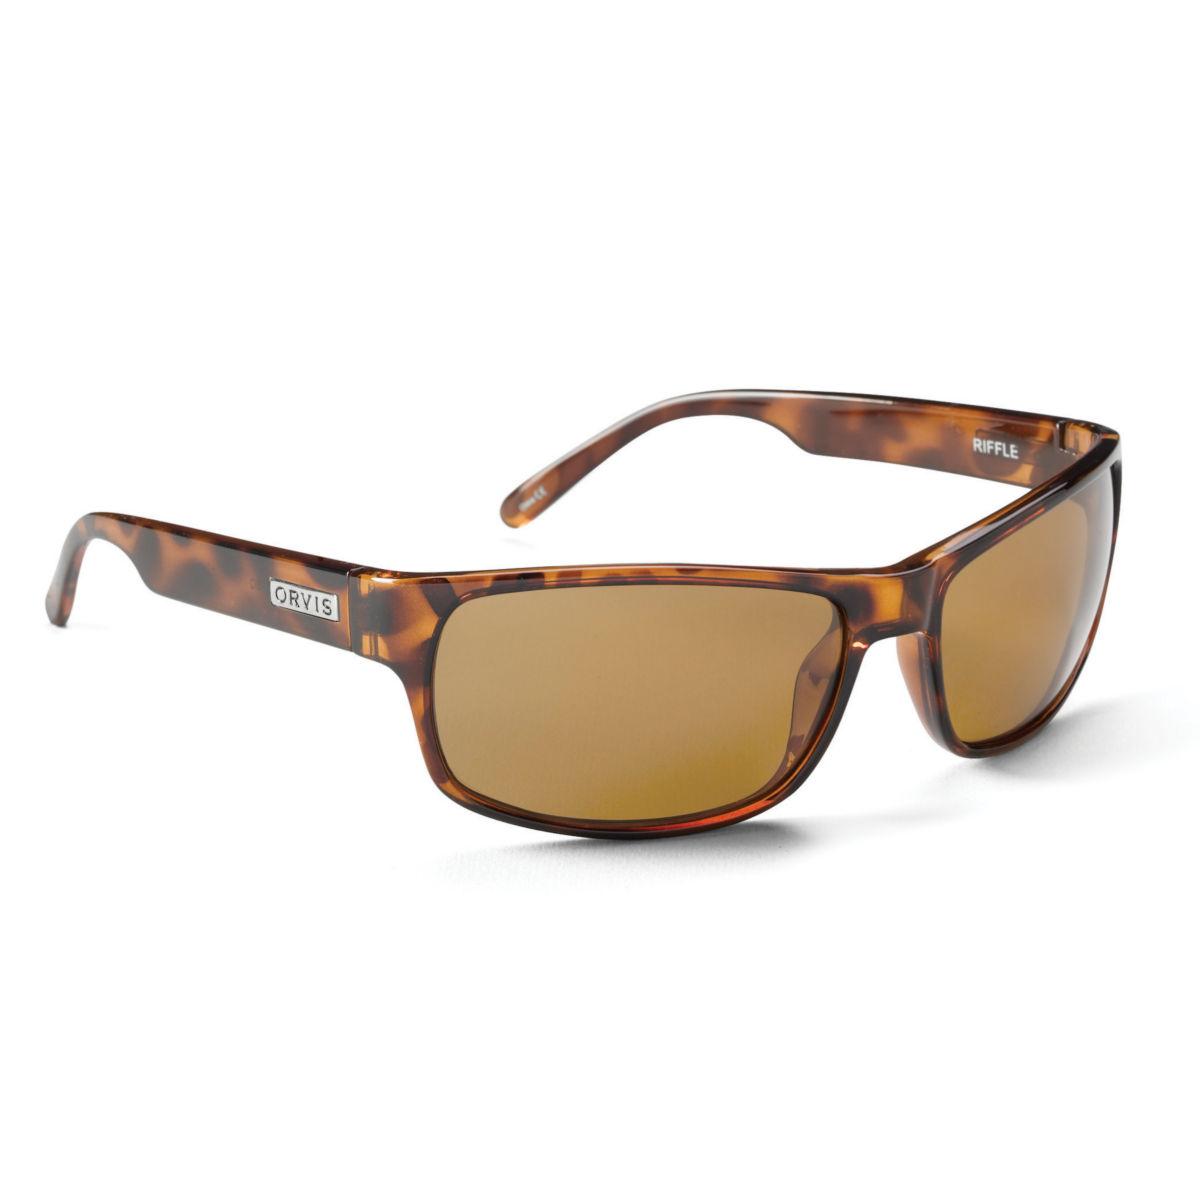 Superlight Riffle Sunglasses - image number 0